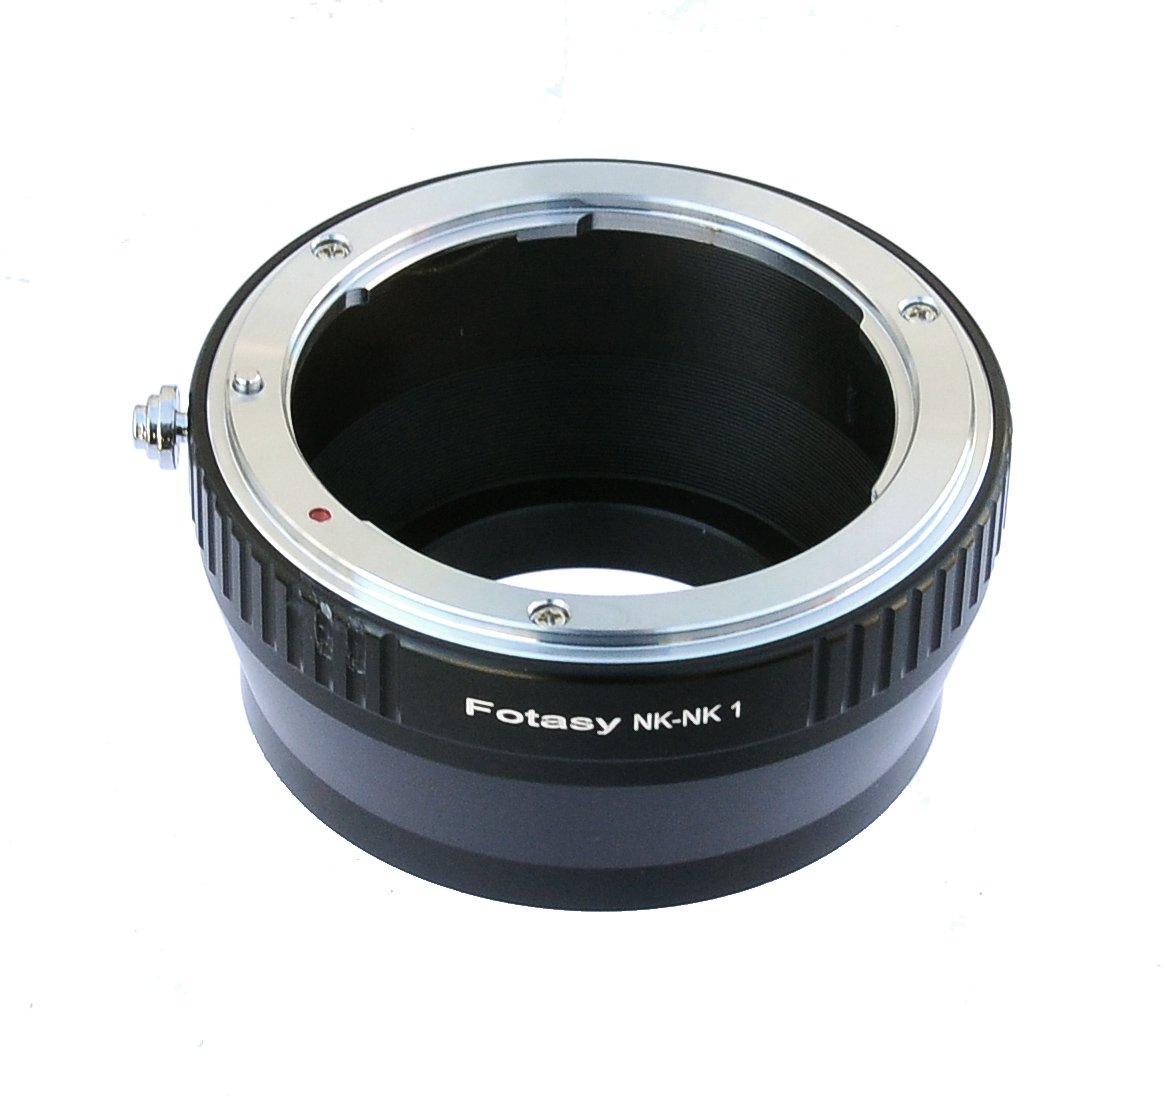 Fotasy Nikon Lens to Nikon 1 Mirrorless Camera Adapter, fit Nikon V1 V2 V3 S1 S2 J1 J2 J3 J4 J5 AW1